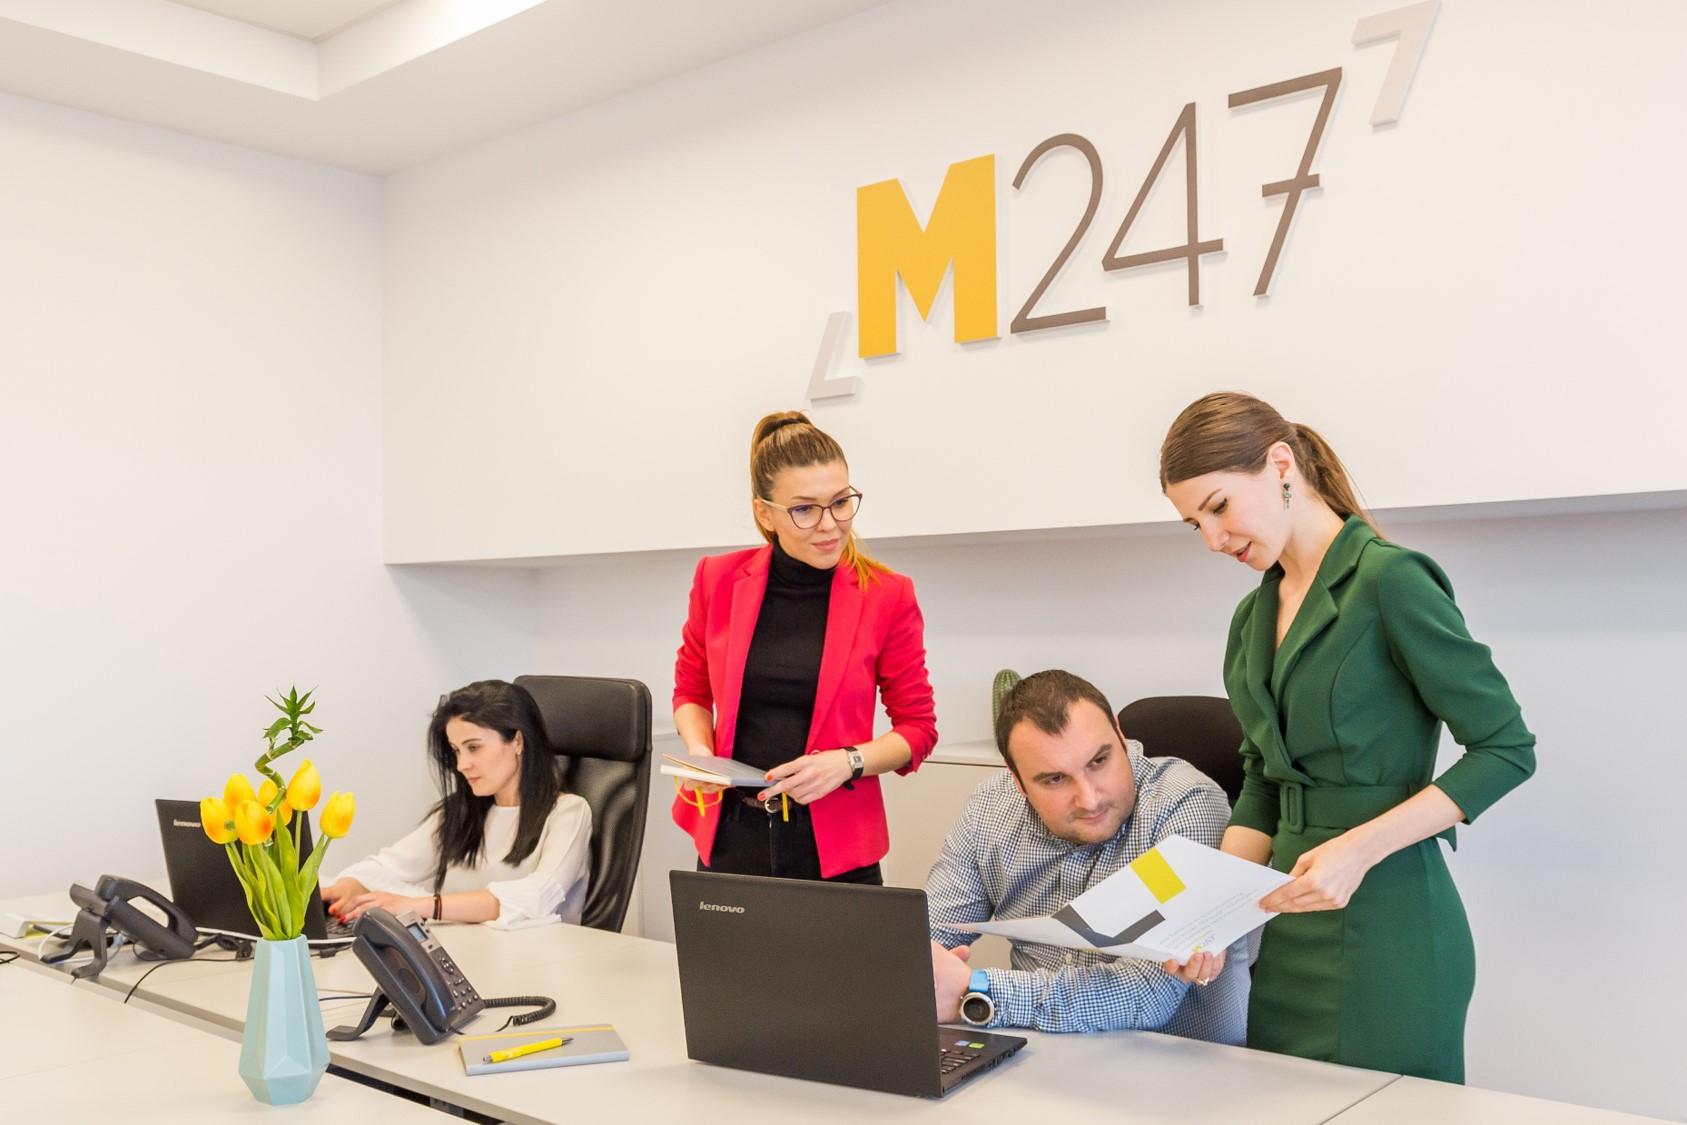 M247 Bucharest - Meeting Room